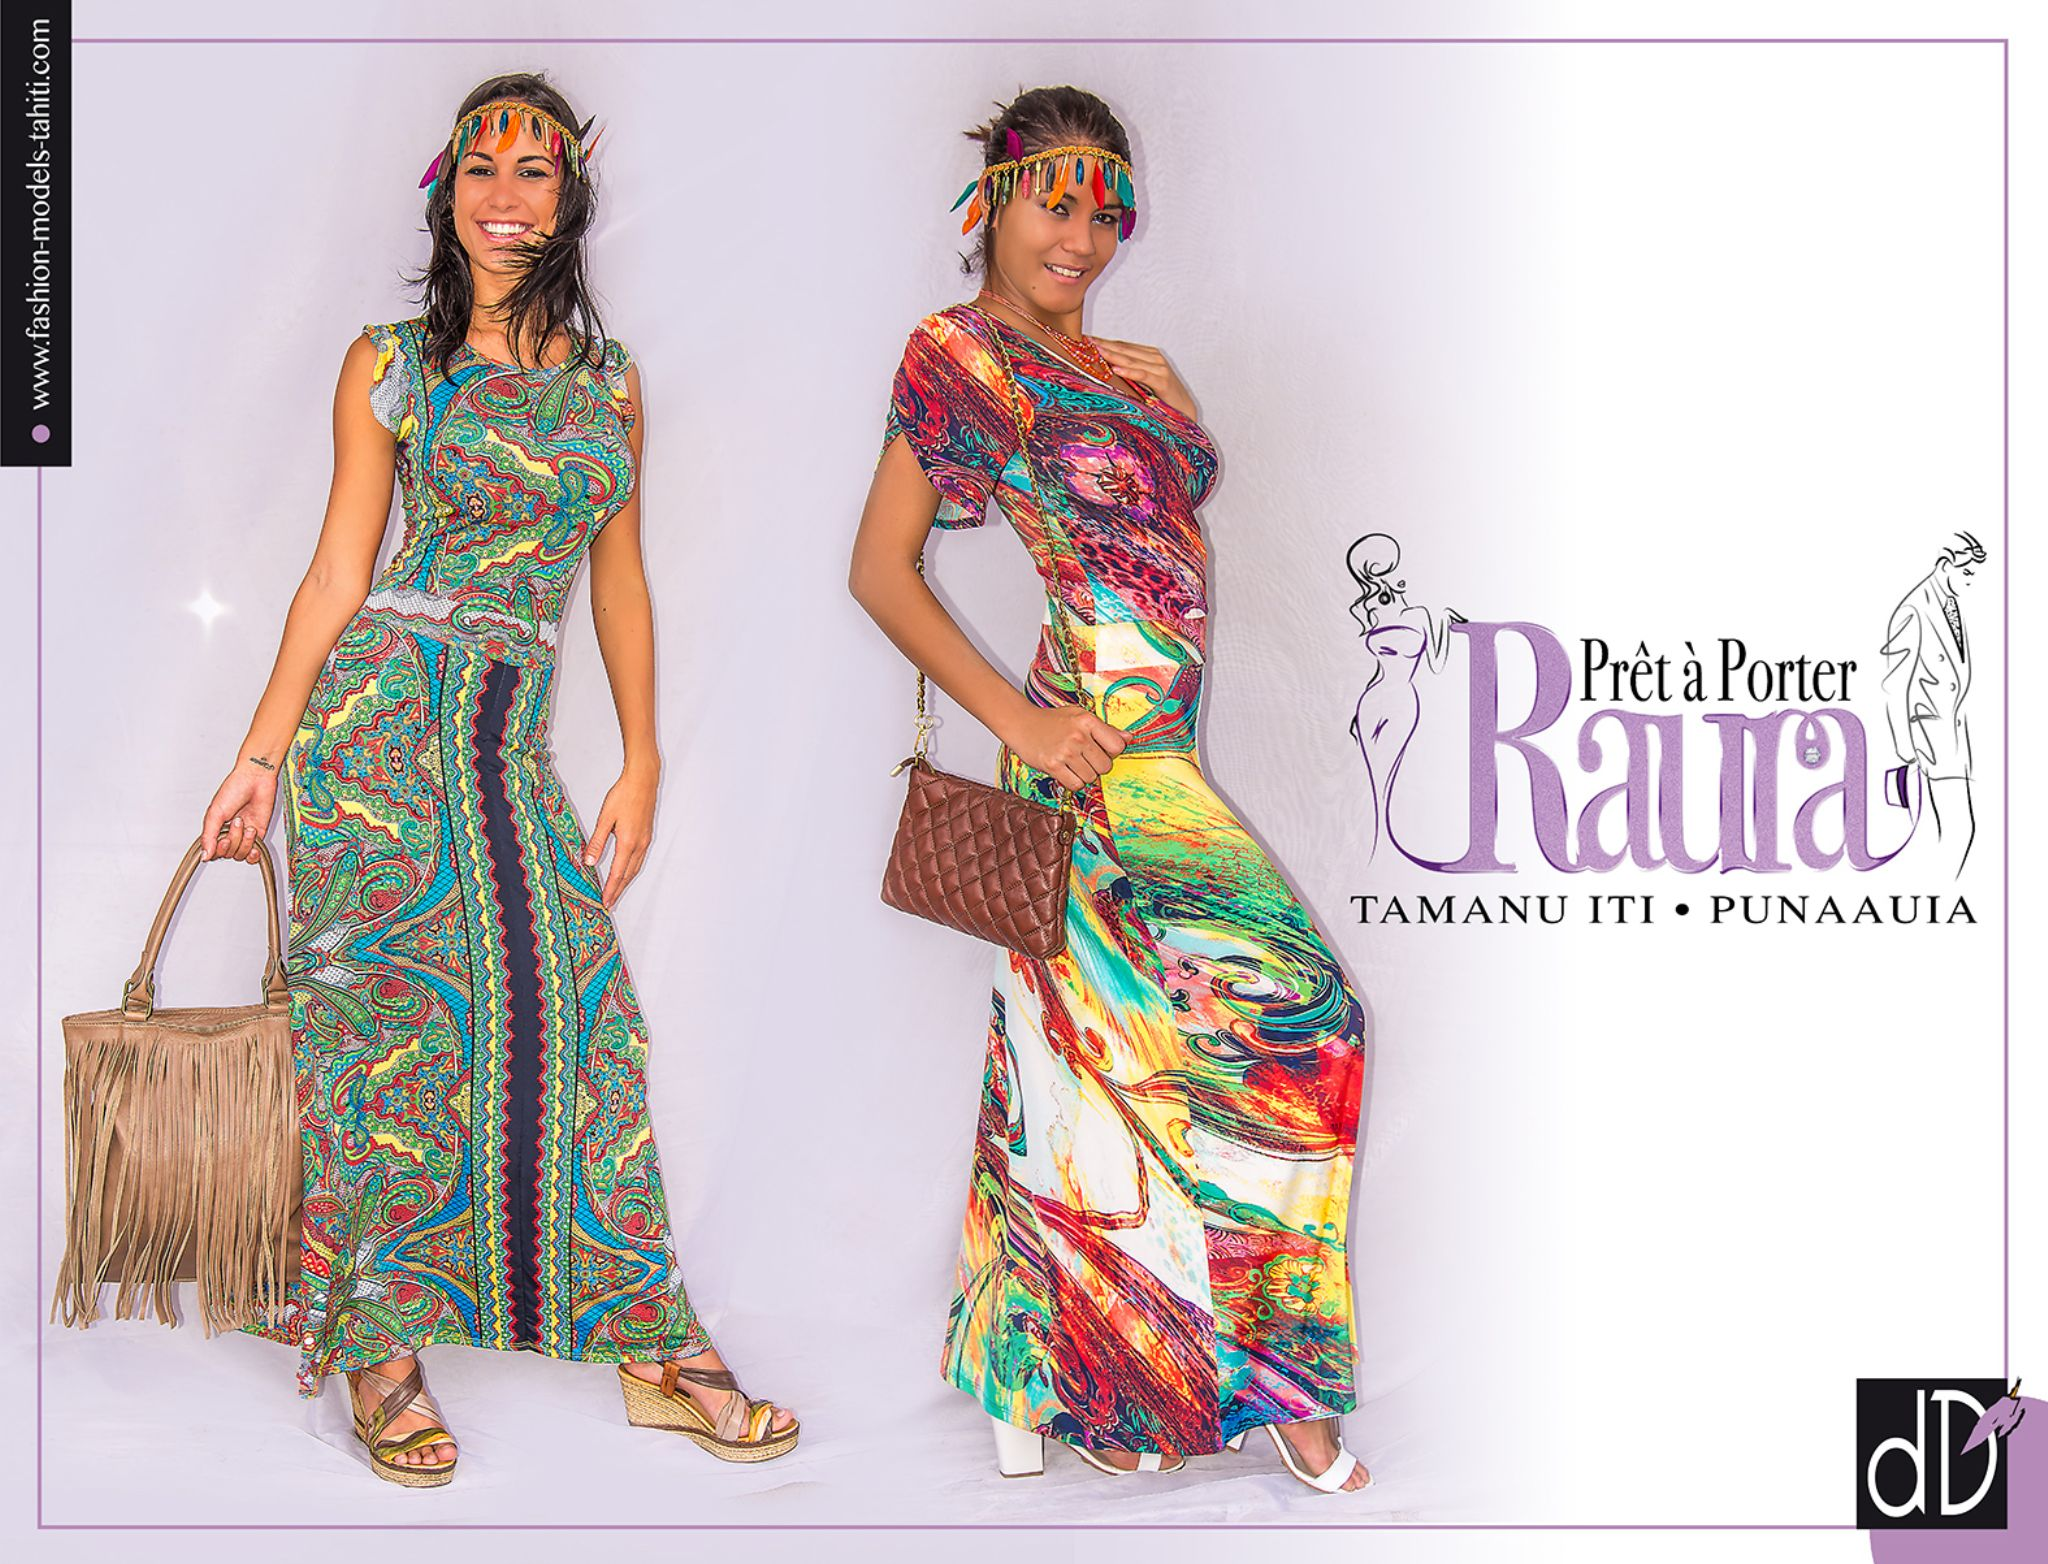 VAHINE Fashion Raura Store TAHITI by Damien Dufour